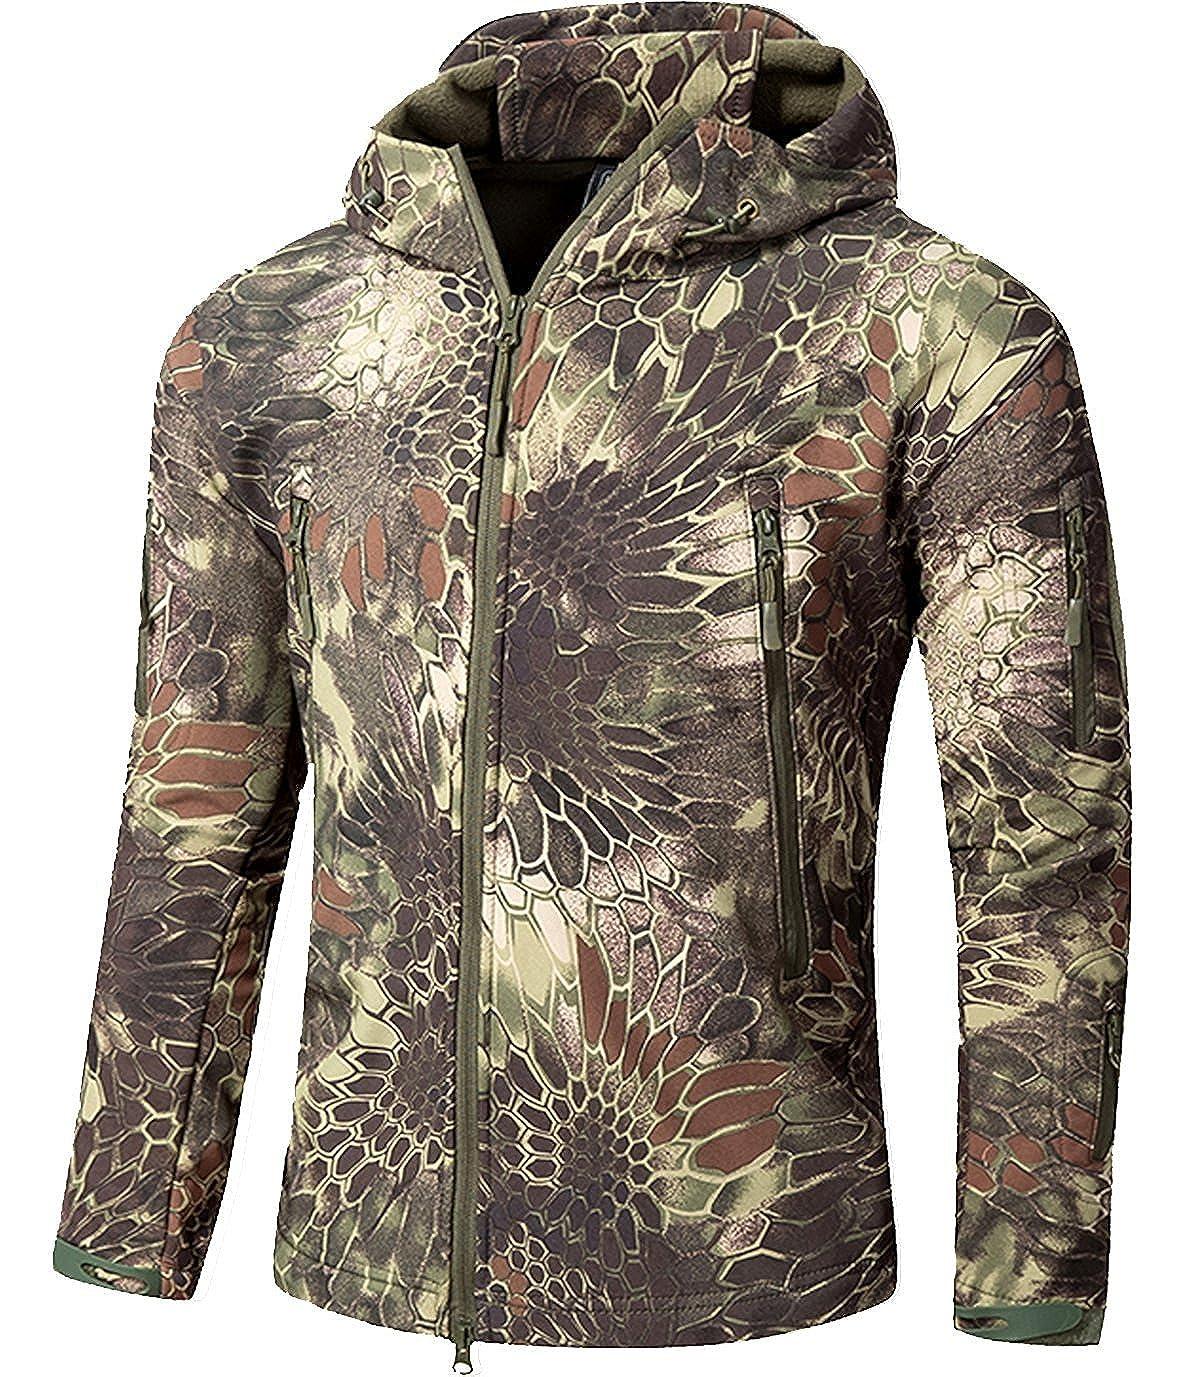 Impermeable militar táctica lucha contra la chaqueta de Softshell camping al aire libre caminar camuflaje Hoodie Coat YFNT